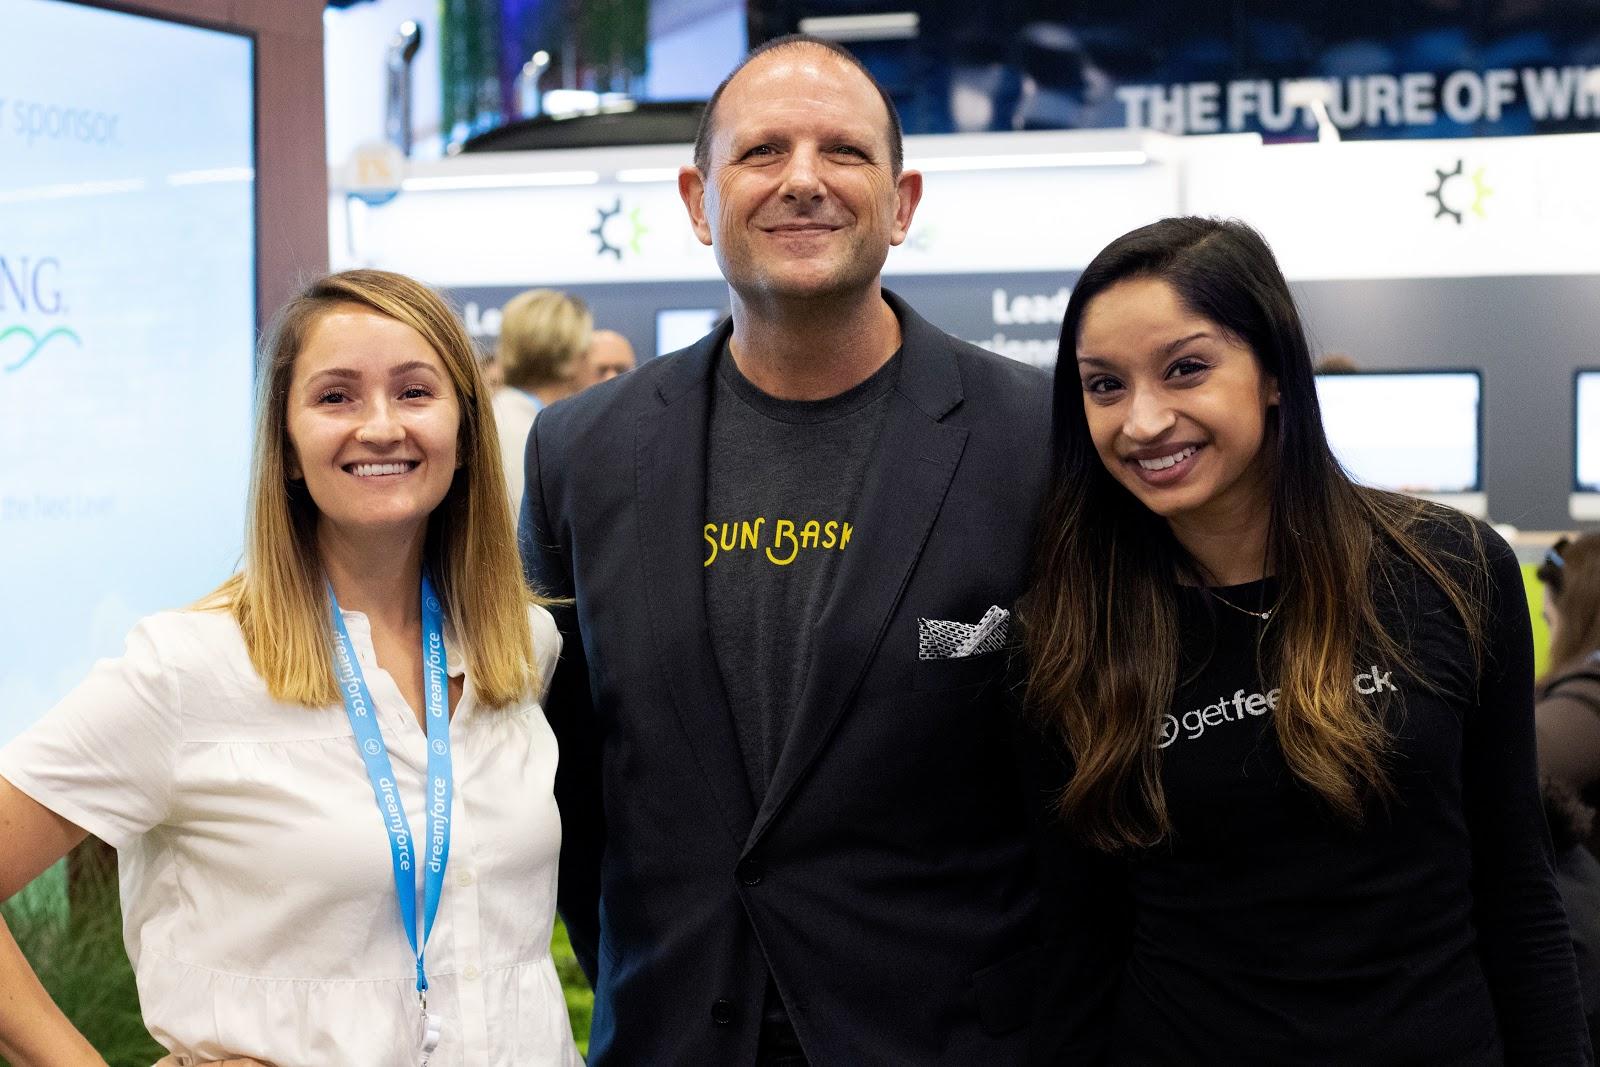 Dreamforce 2018: Crystal Reitmeir - Product Marketing Manager, GetFeedback & Sateja Parulekar - VP of Product Marketing and Alliances, GetFeedback & Brett Frazer - Head of Customer Service, Sunbasket